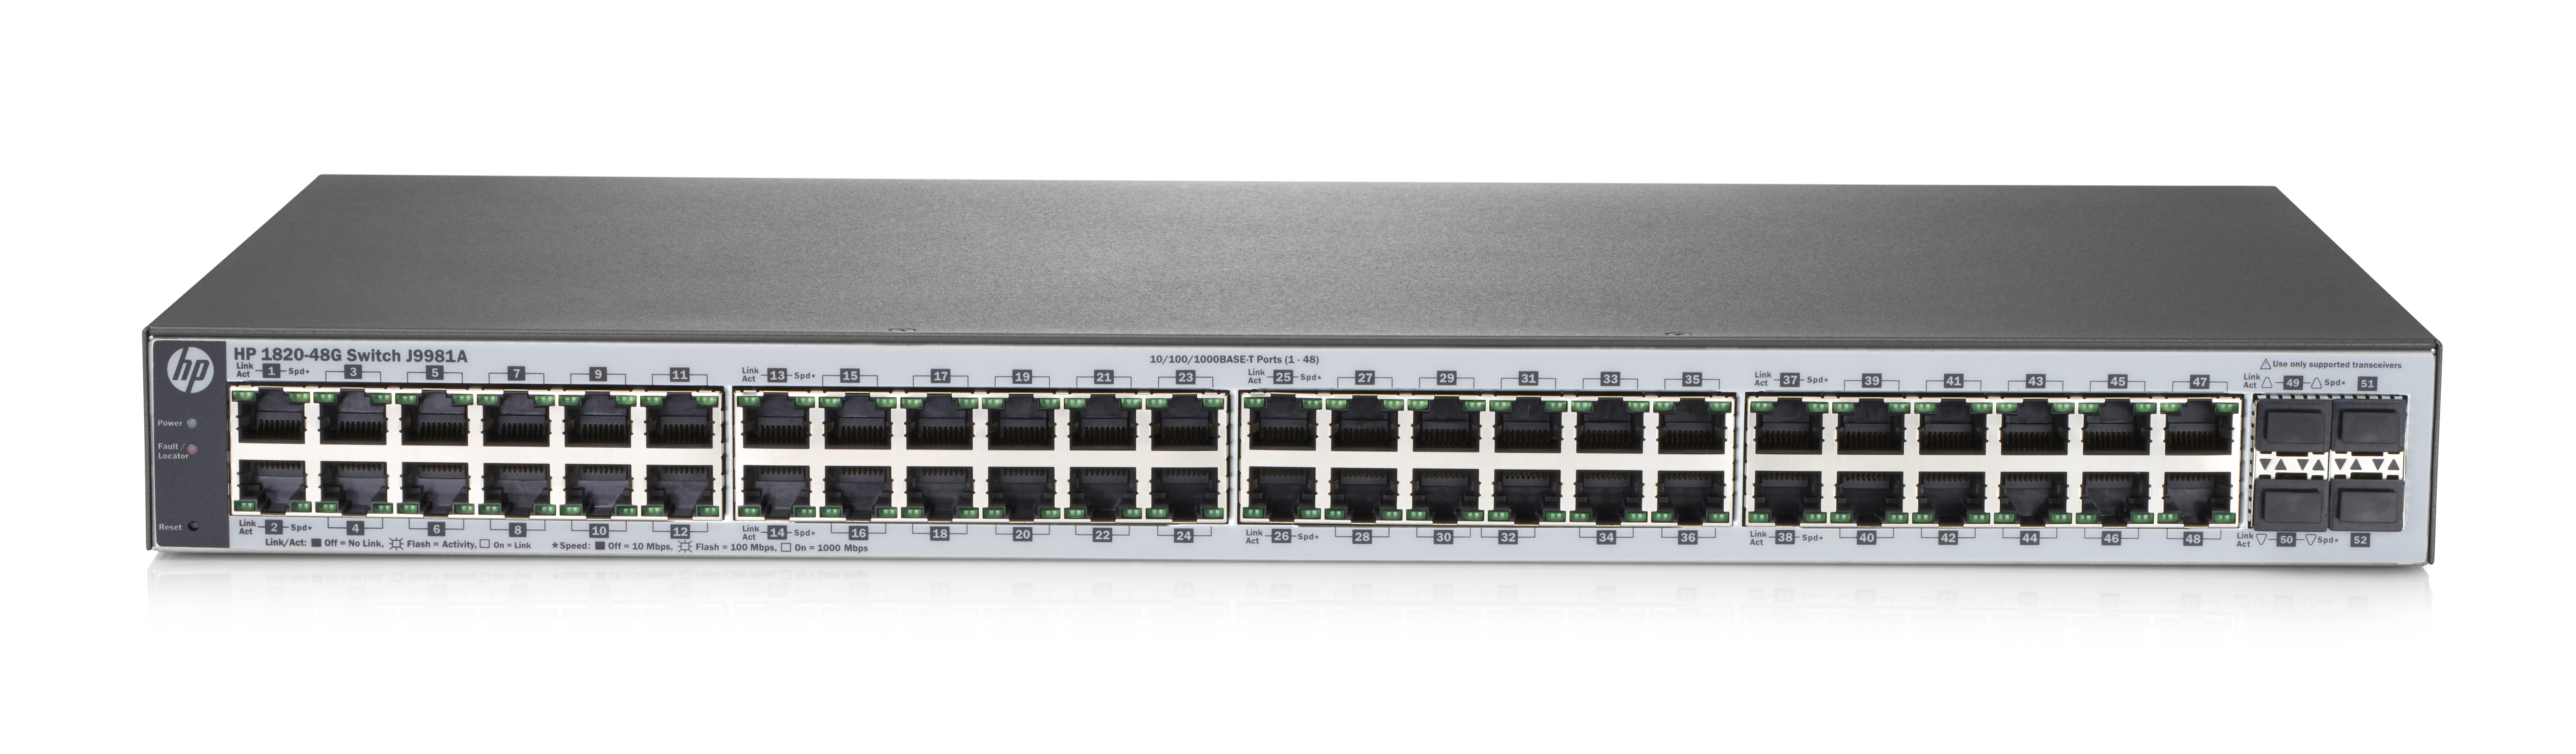 HP Enterprise 182048G Managed L2 Gigabit Ethernet (10/100/1000) Full duplex Rack mounting 1U